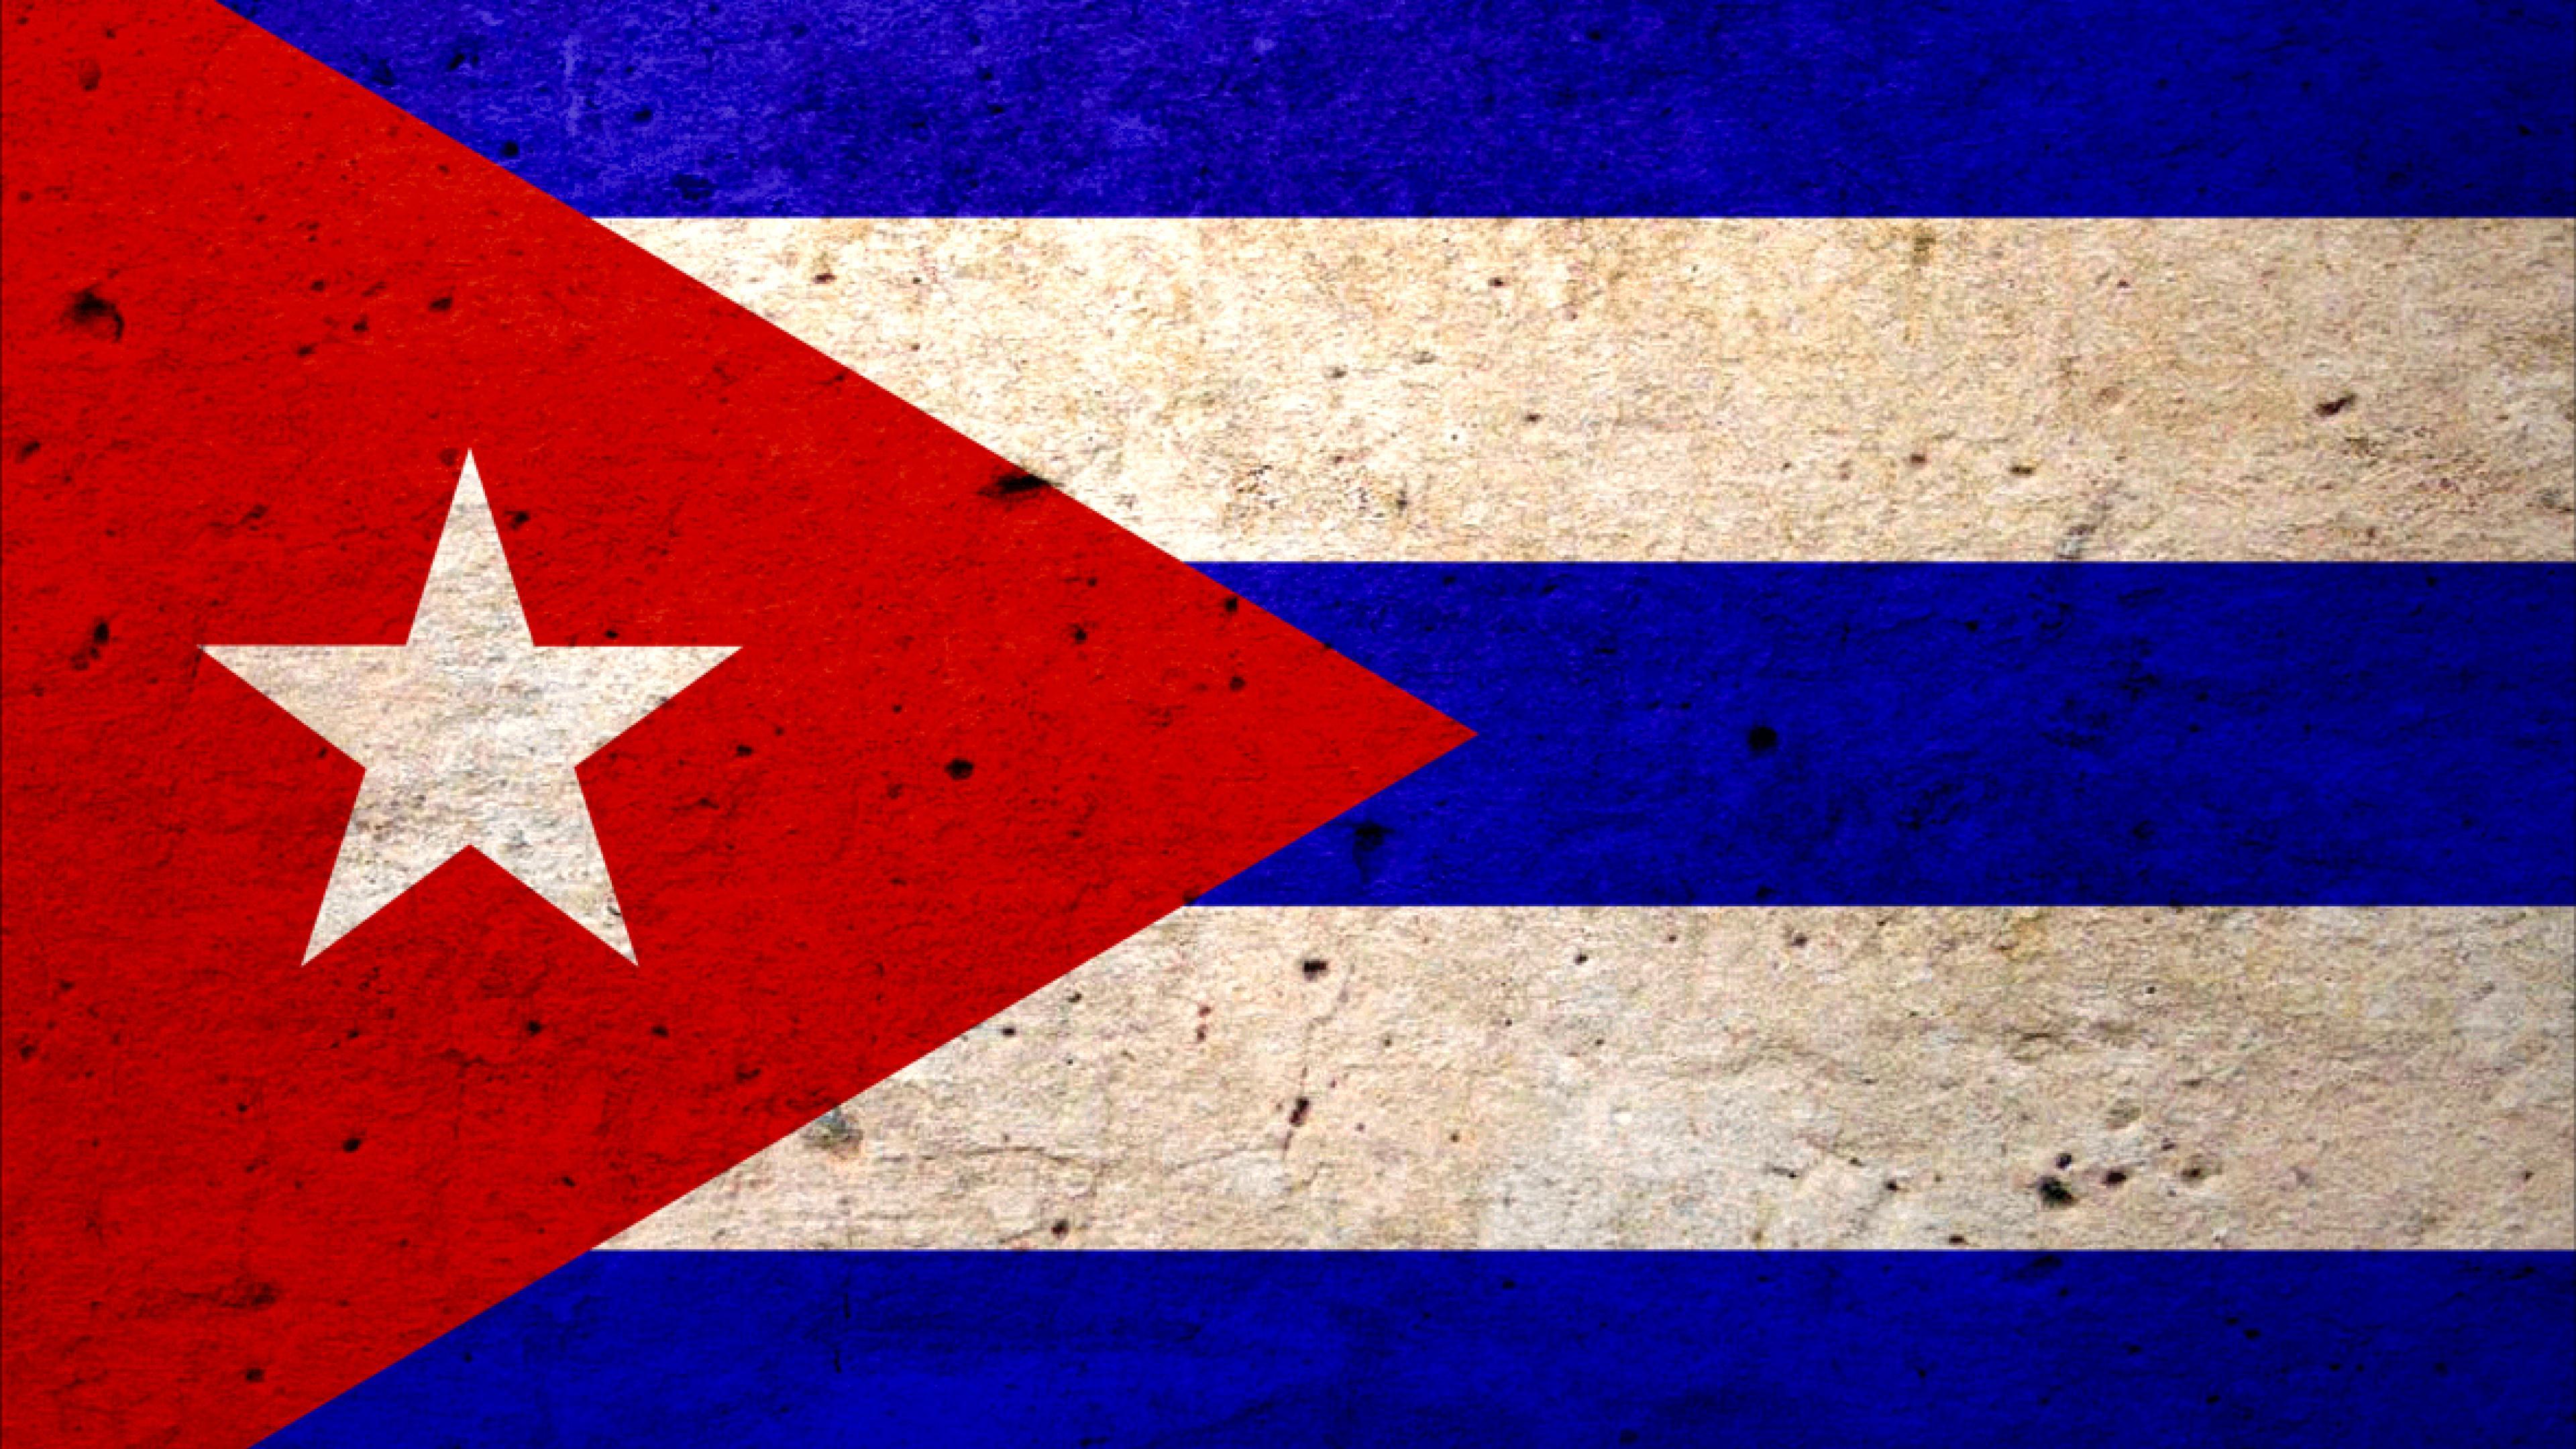 flags cuba cuban flag 9J8x 3840x2160